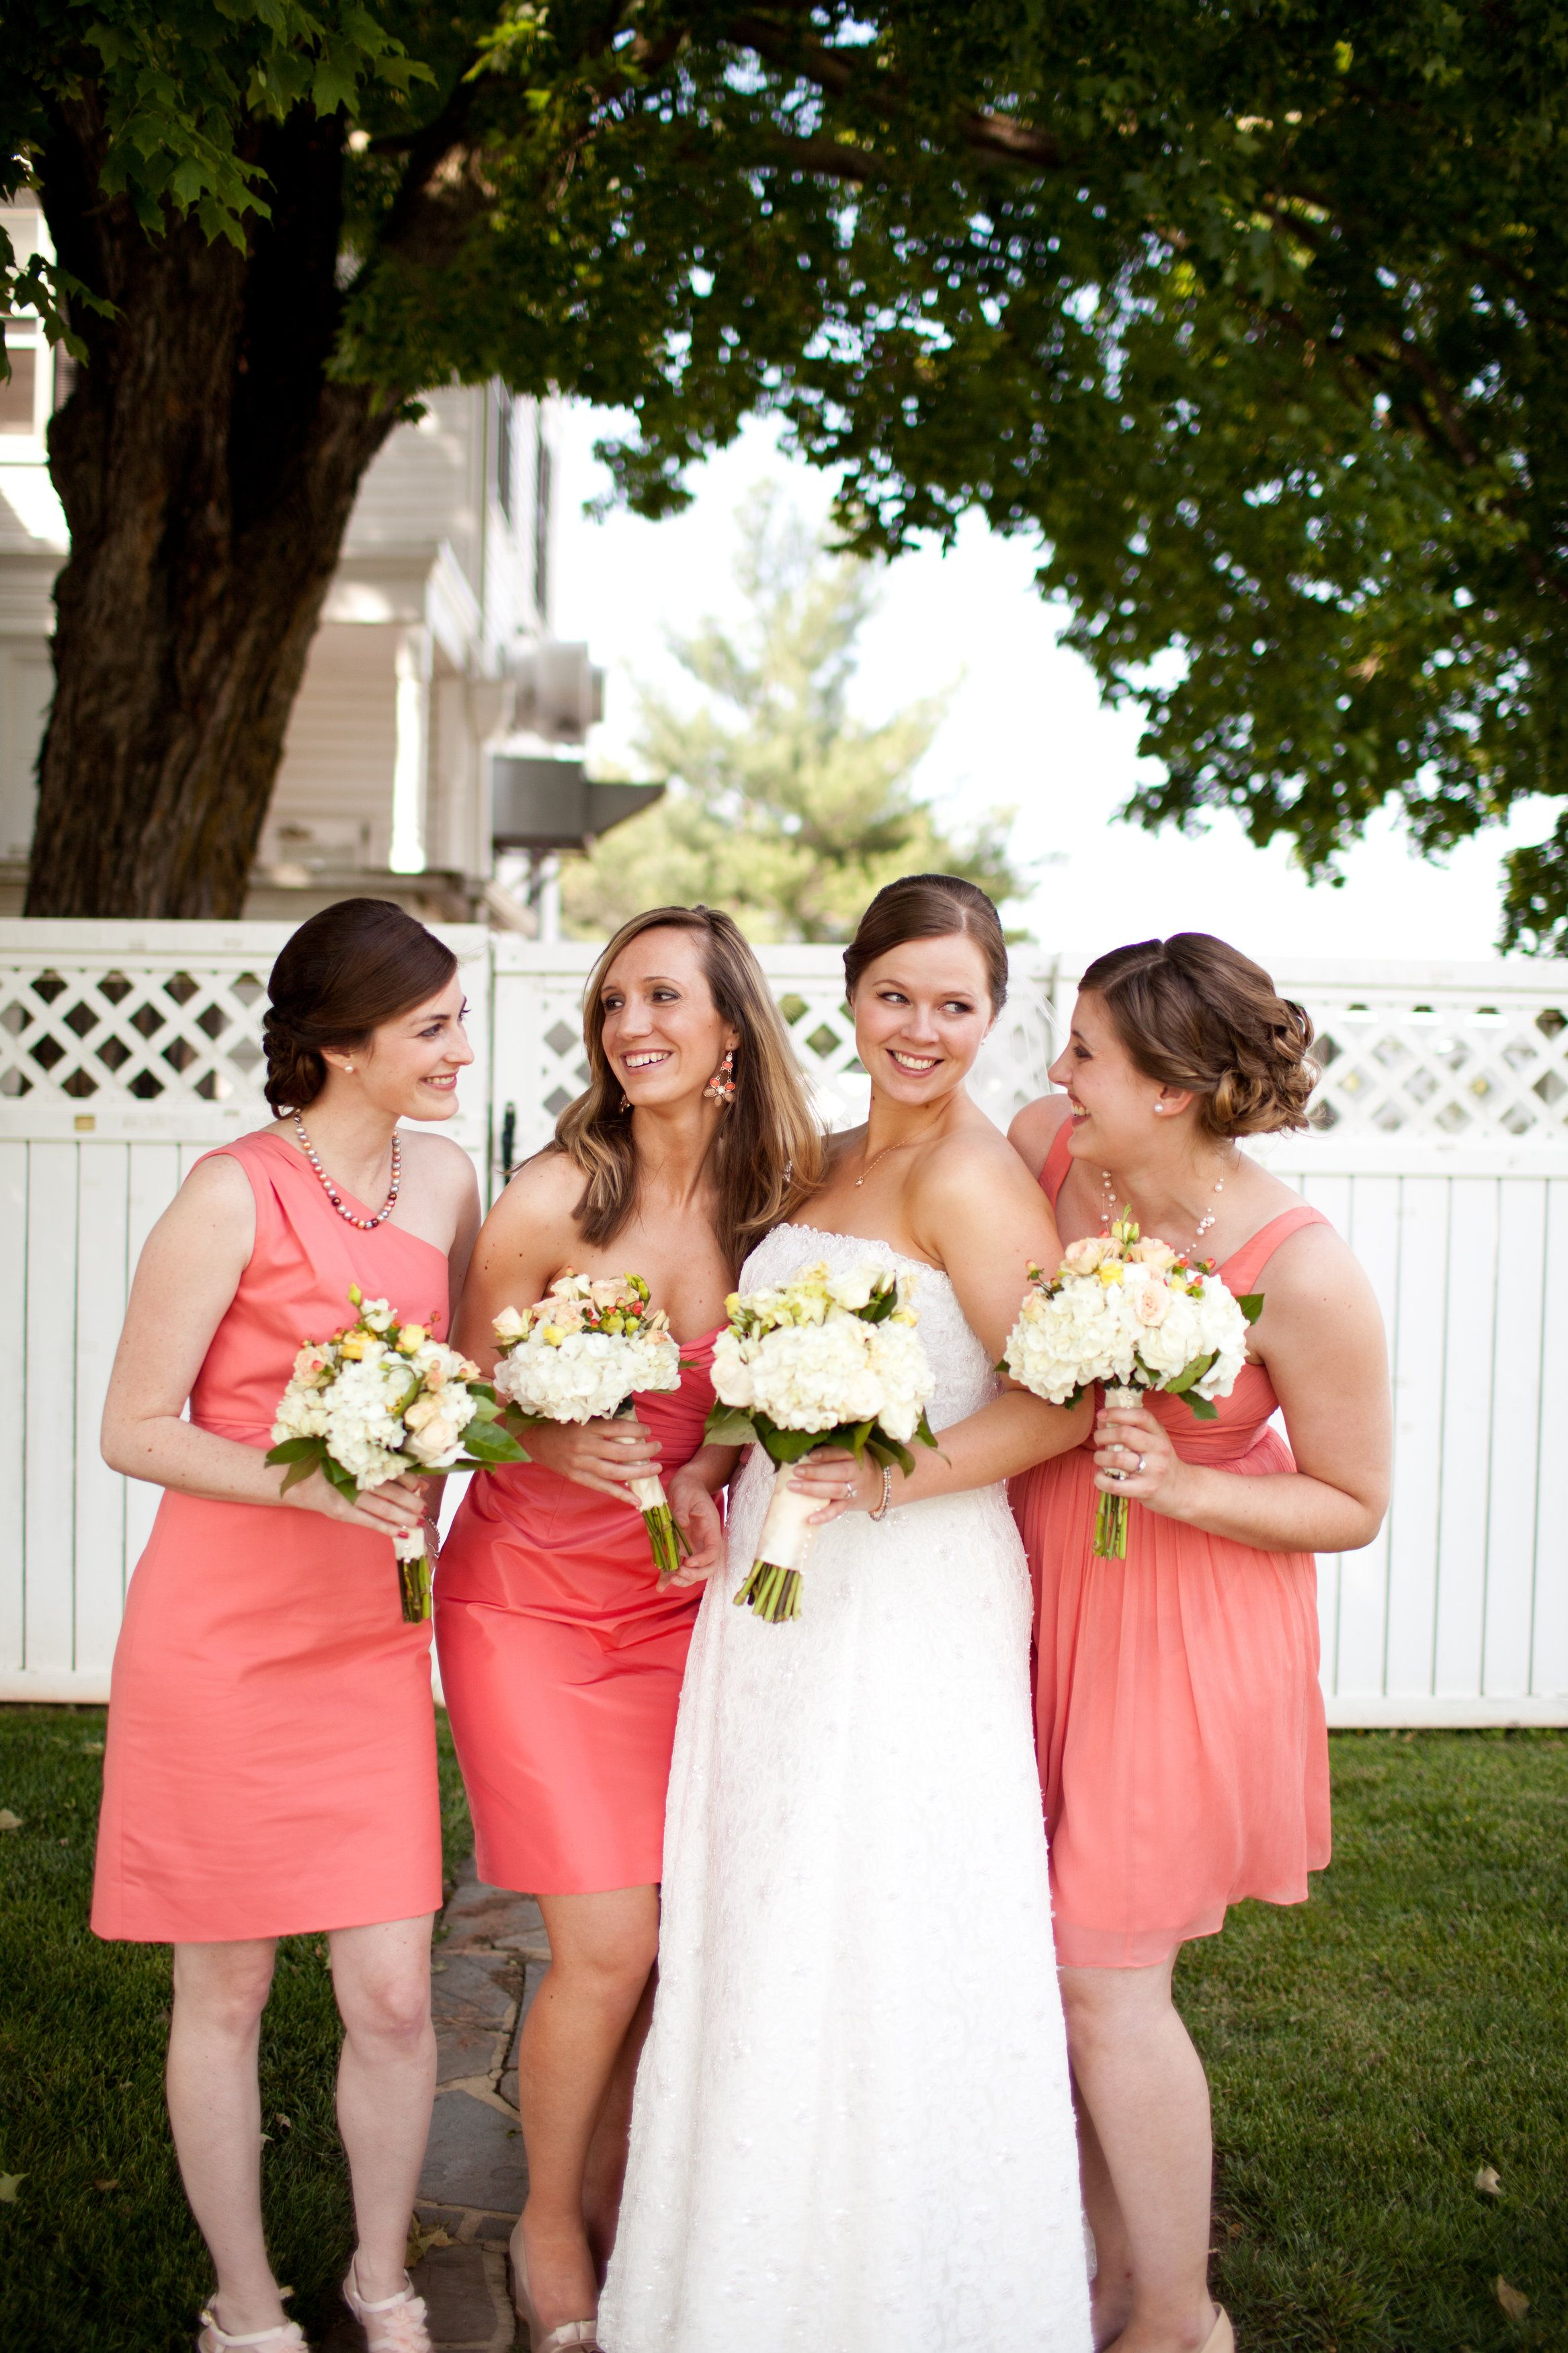 Jew coral bridesmaid dresses j crew bridesmaid dresses i bridesmaid jew coral bridesmaid dresses ombrellifo Gallery